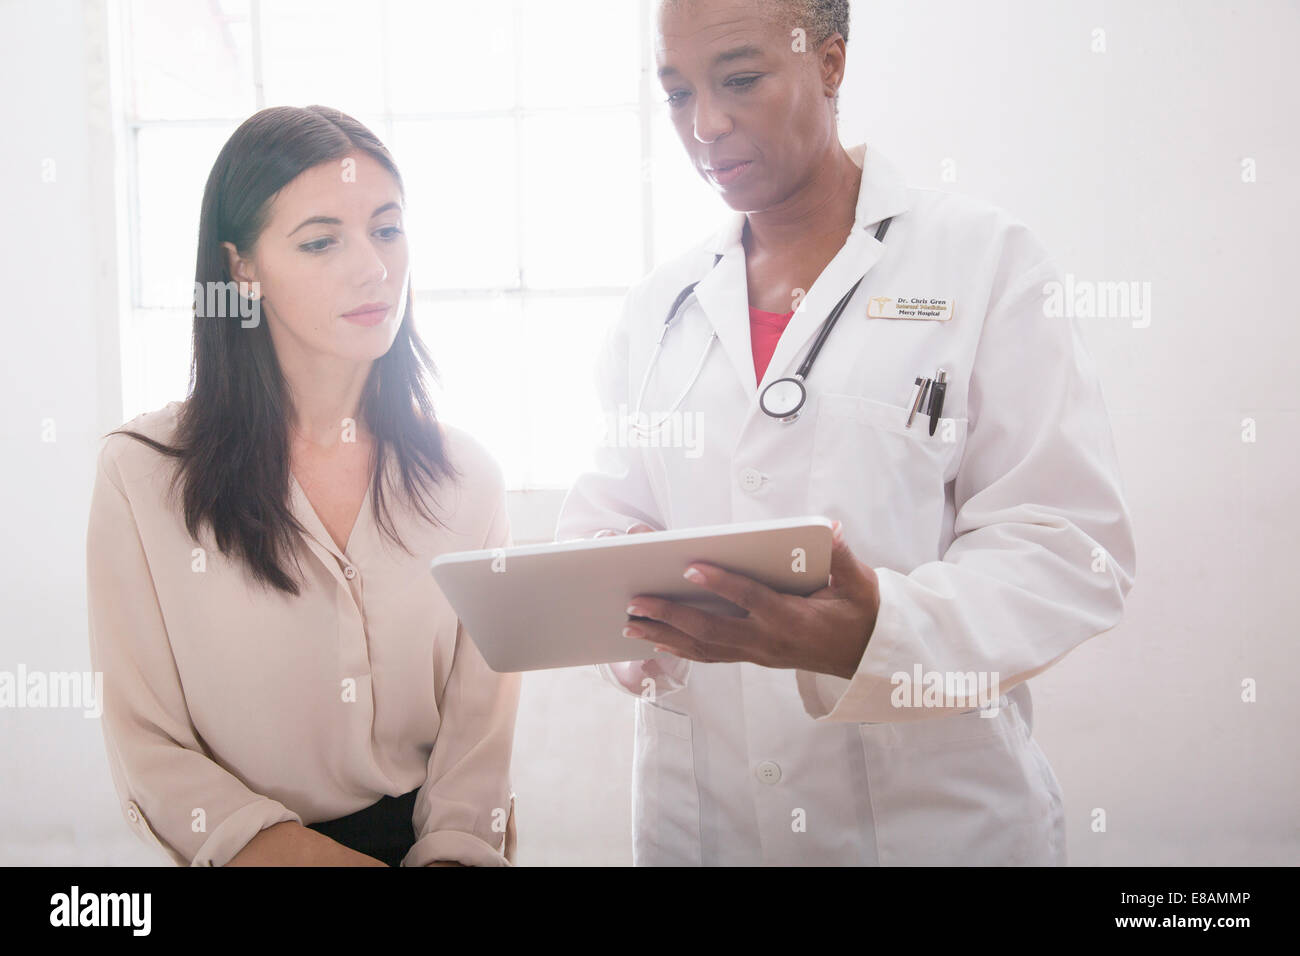 Female doctor using digital tablet in consultation - Stock Image